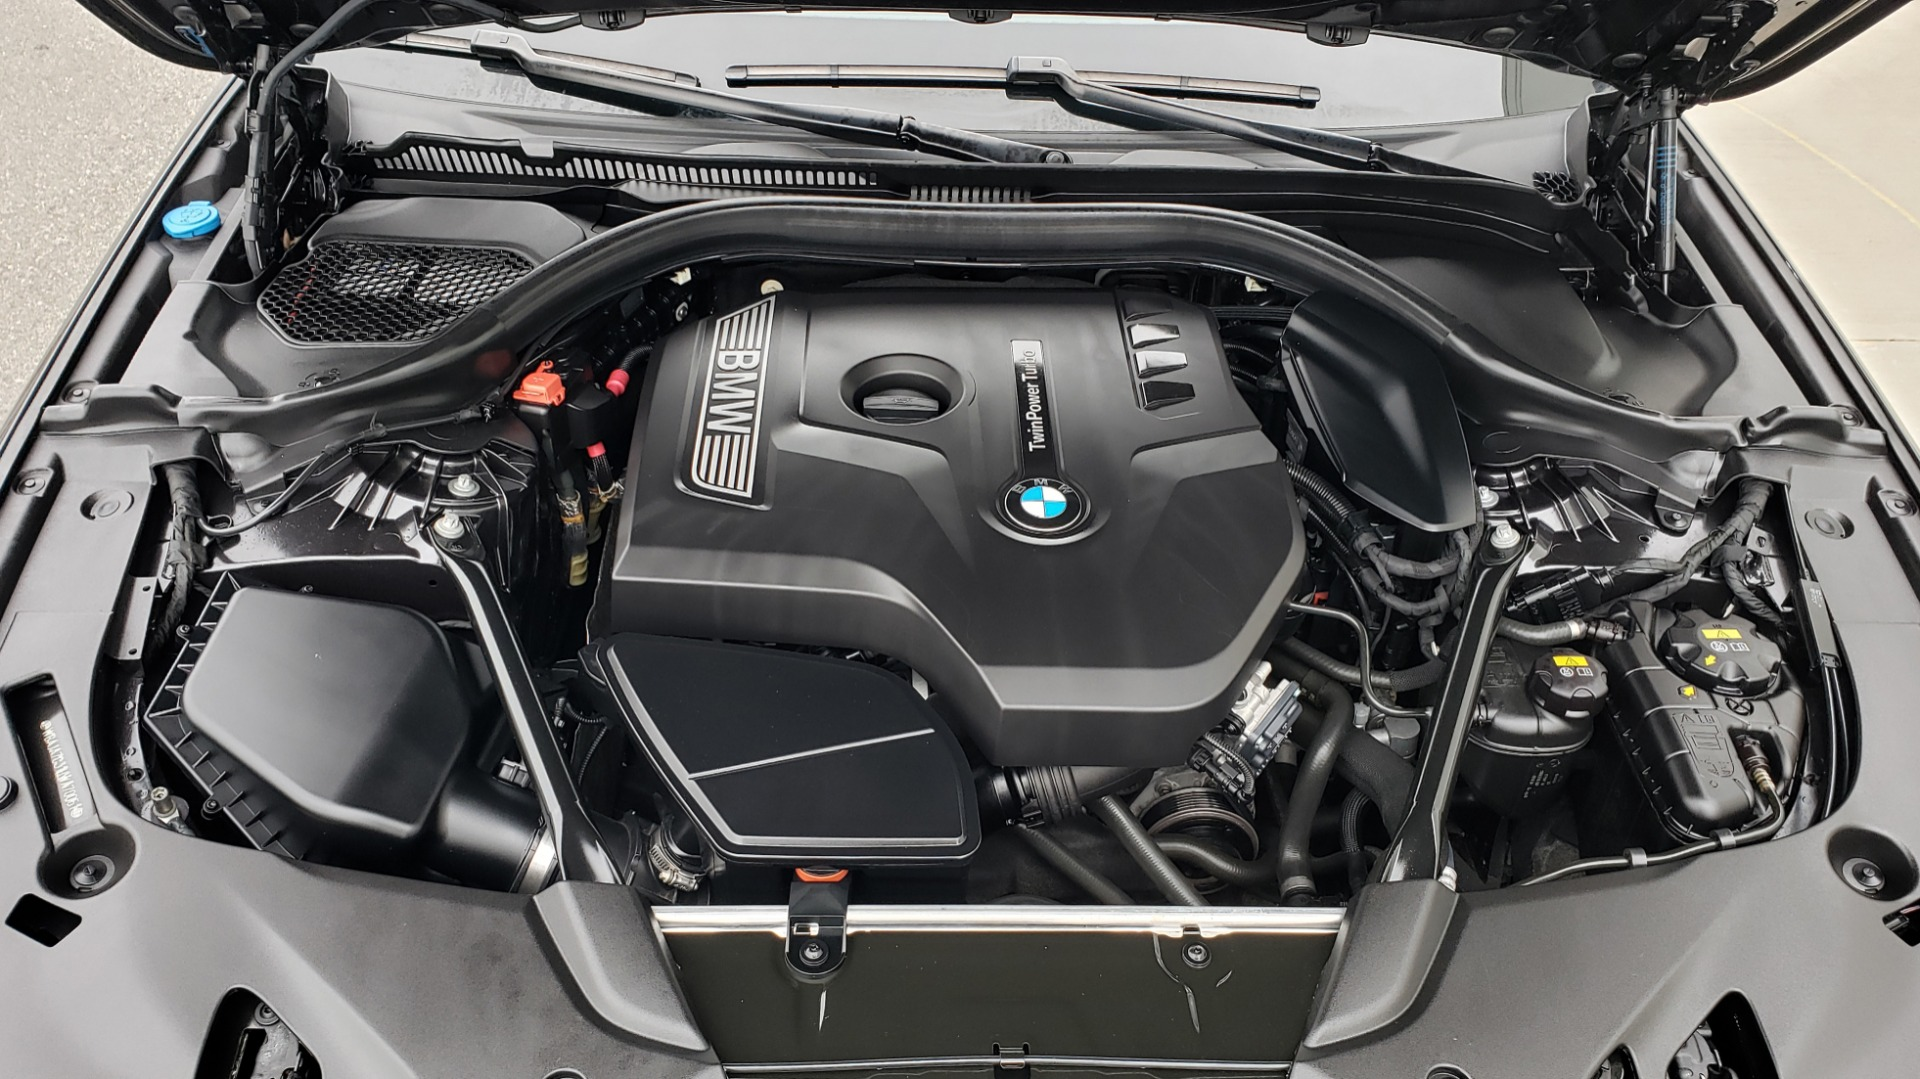 Used 2017 BMW 5 SERIES 530IXDRIVE / PREM PKG / DRVR ASST PLUS / CLD WTHR / APPLE CARPLAY for sale Sold at Formula Imports in Charlotte NC 28227 10